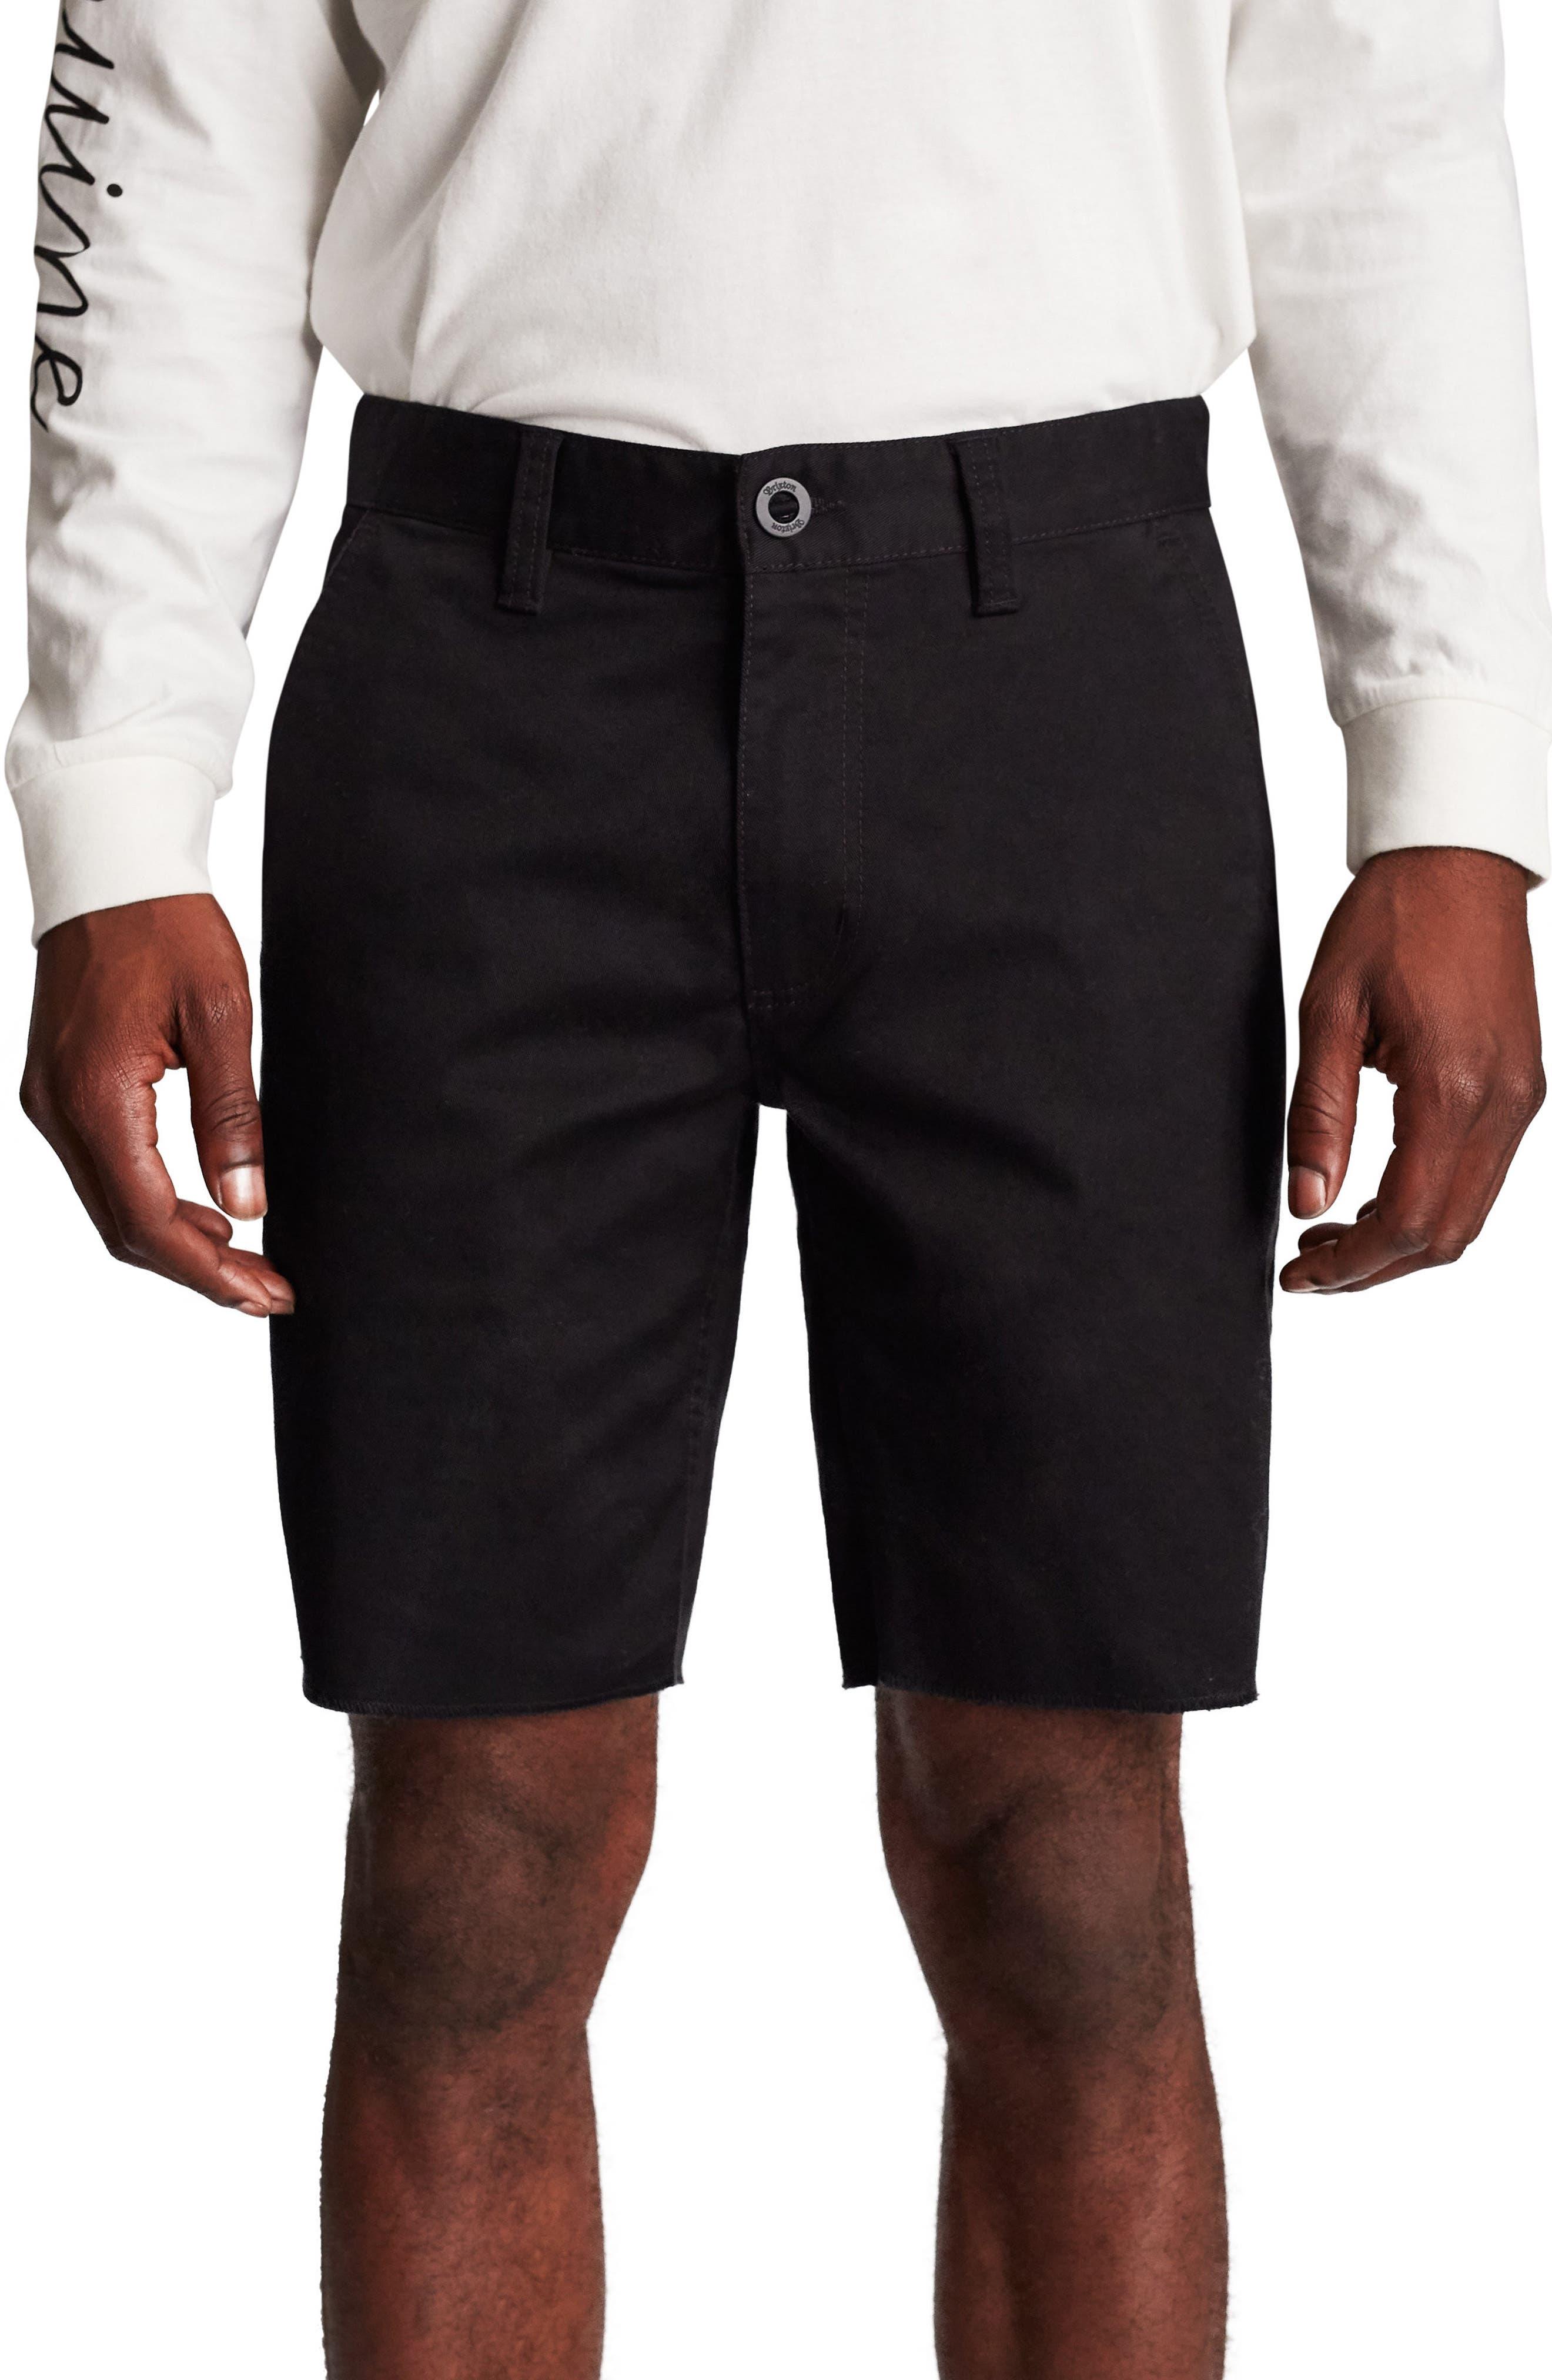 Toil II Chino Shorts,                             Main thumbnail 1, color,                             BLACK